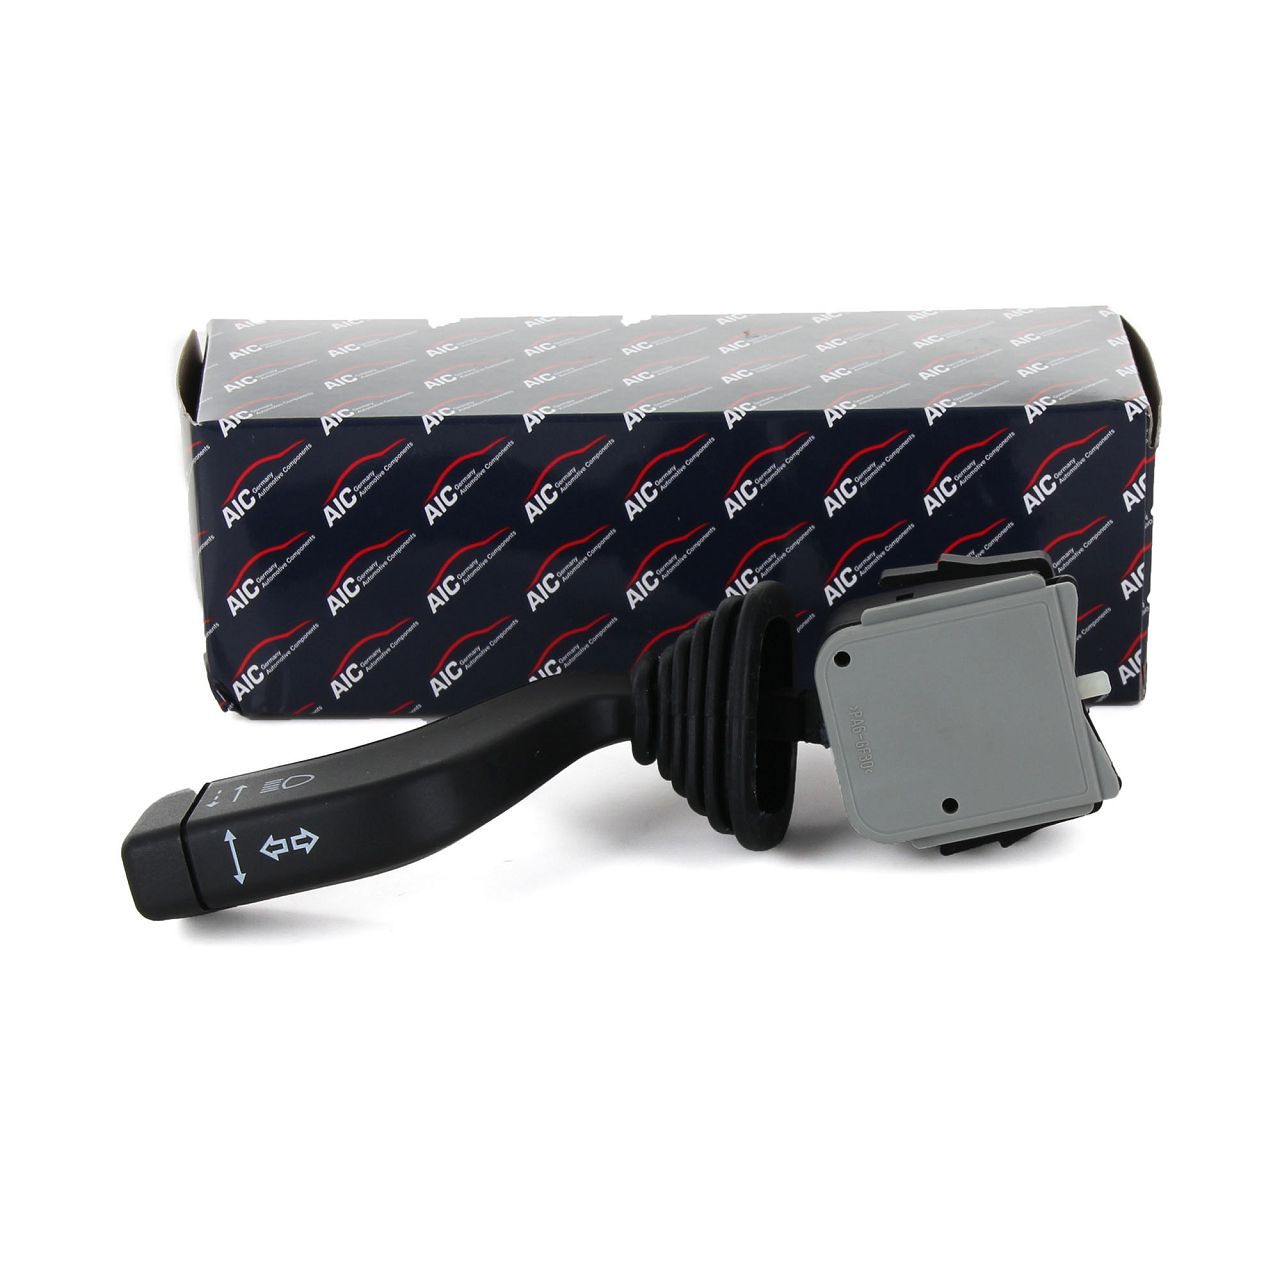 AIC Lenkstockschalter Blinkerschalter Blinkerhebel für OPEL ASTRA CORSA VECTRA